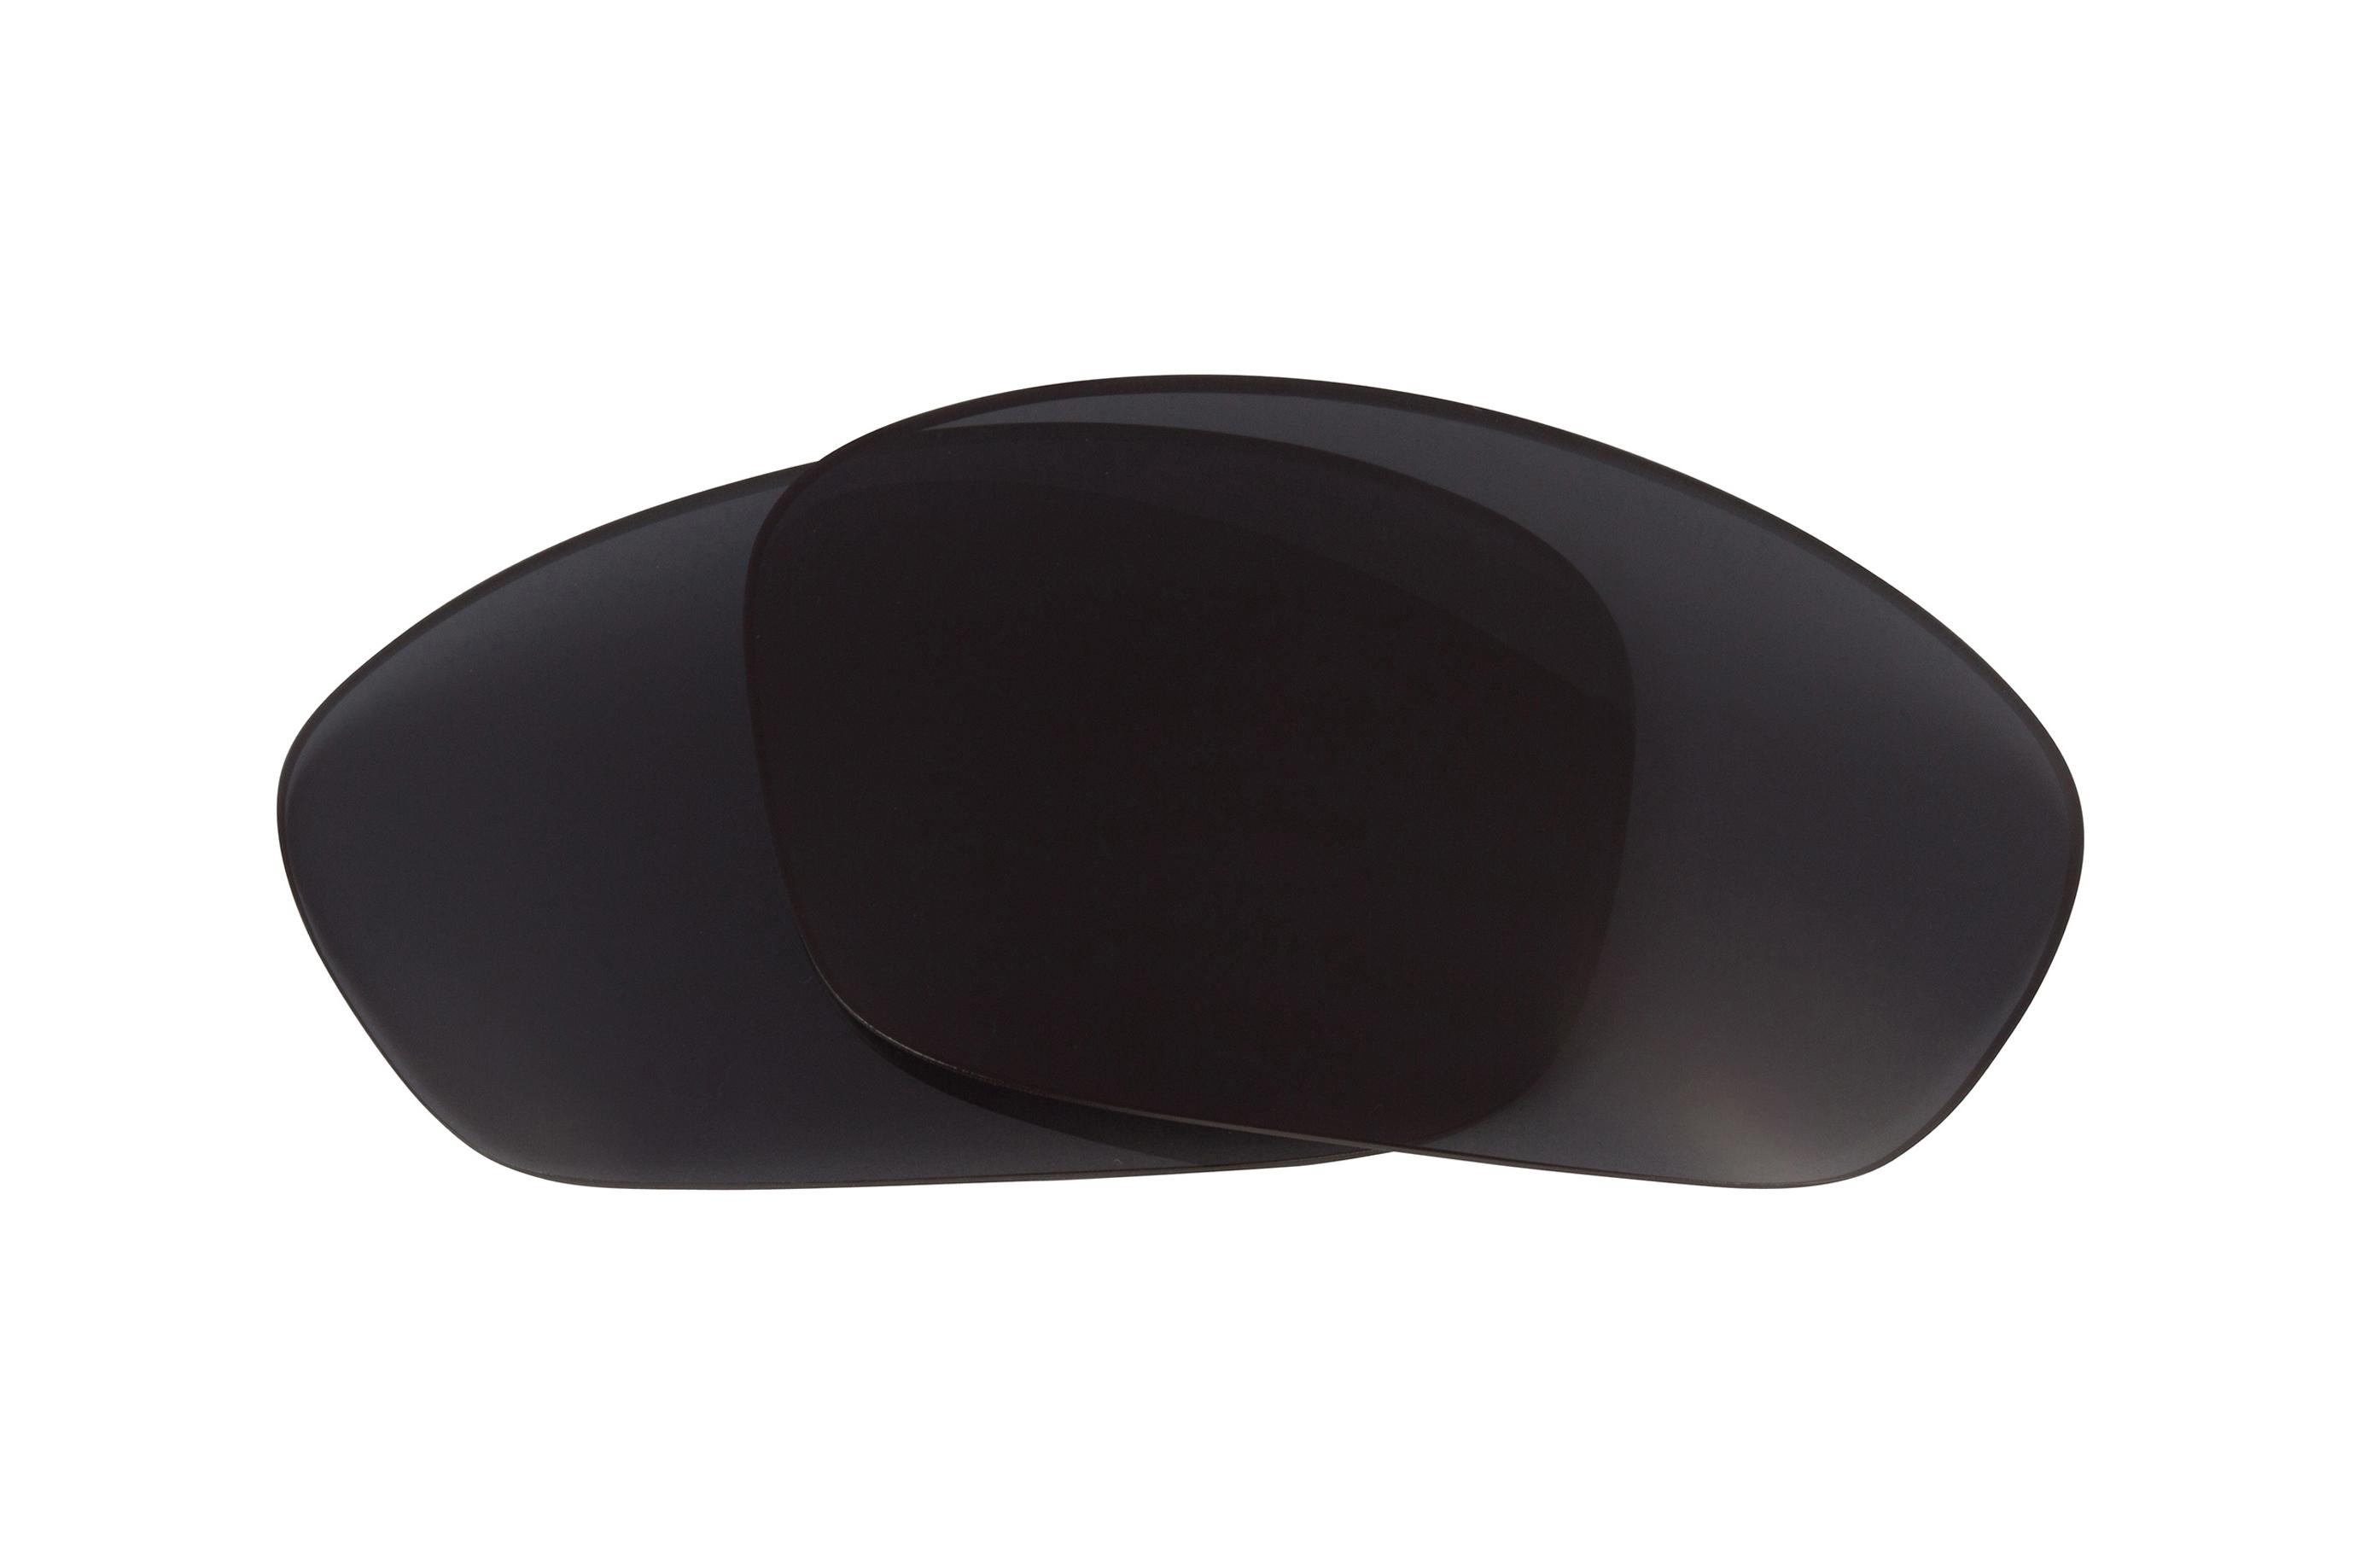 628d9218eb Fits Maui Jim Stingray - Seek Optics